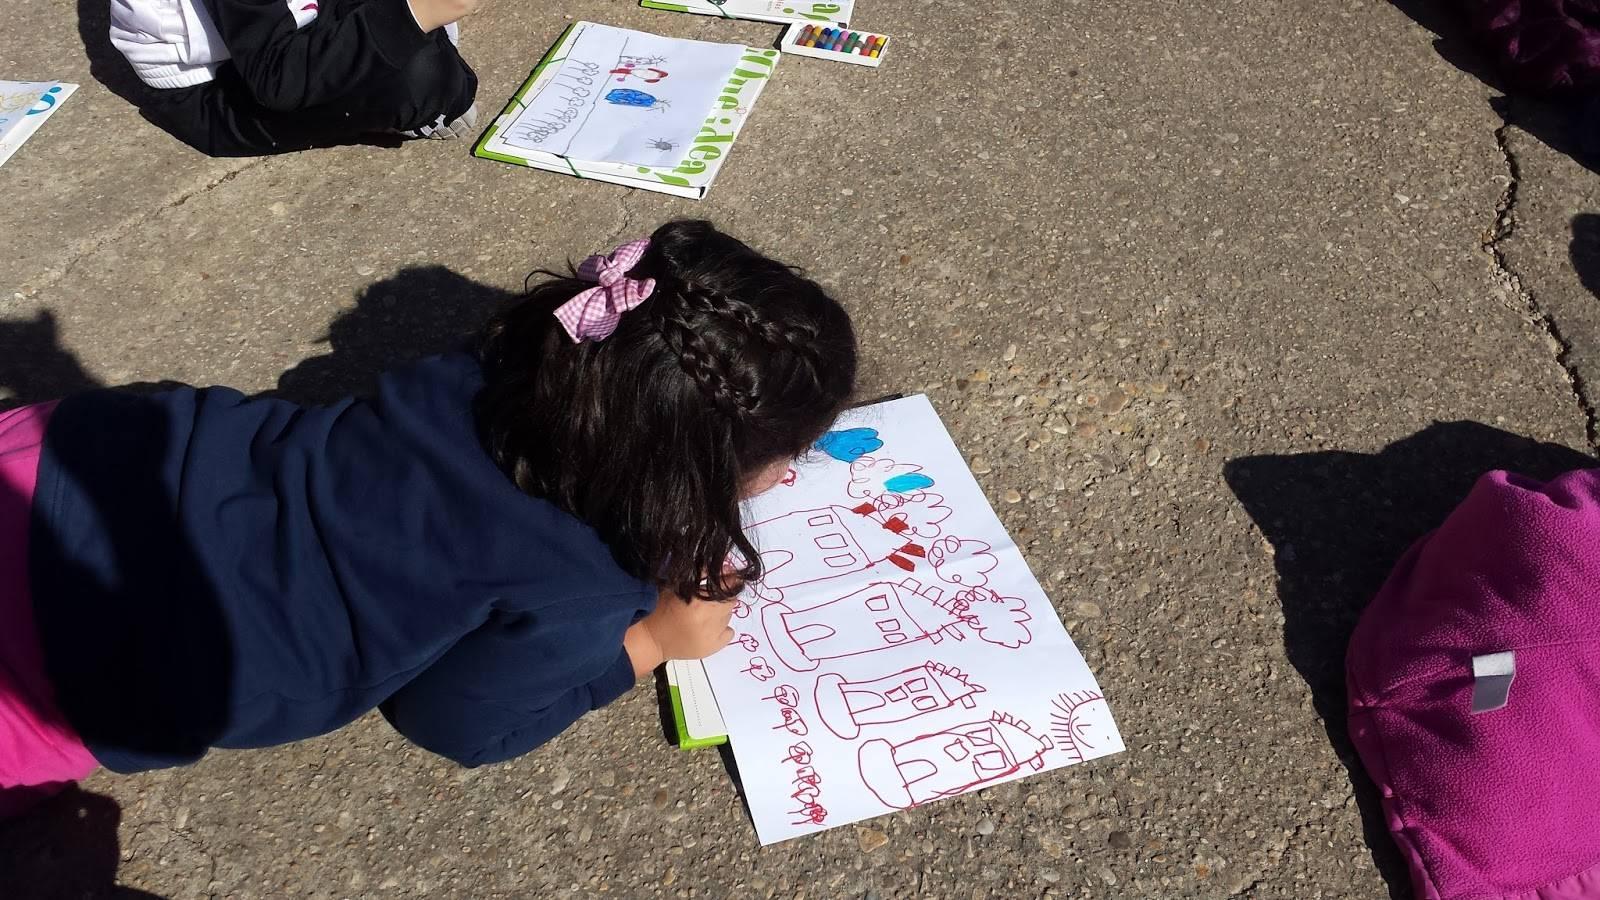 alumna-del-ceip-carrasco-alcalde-de-herencia-dibujando